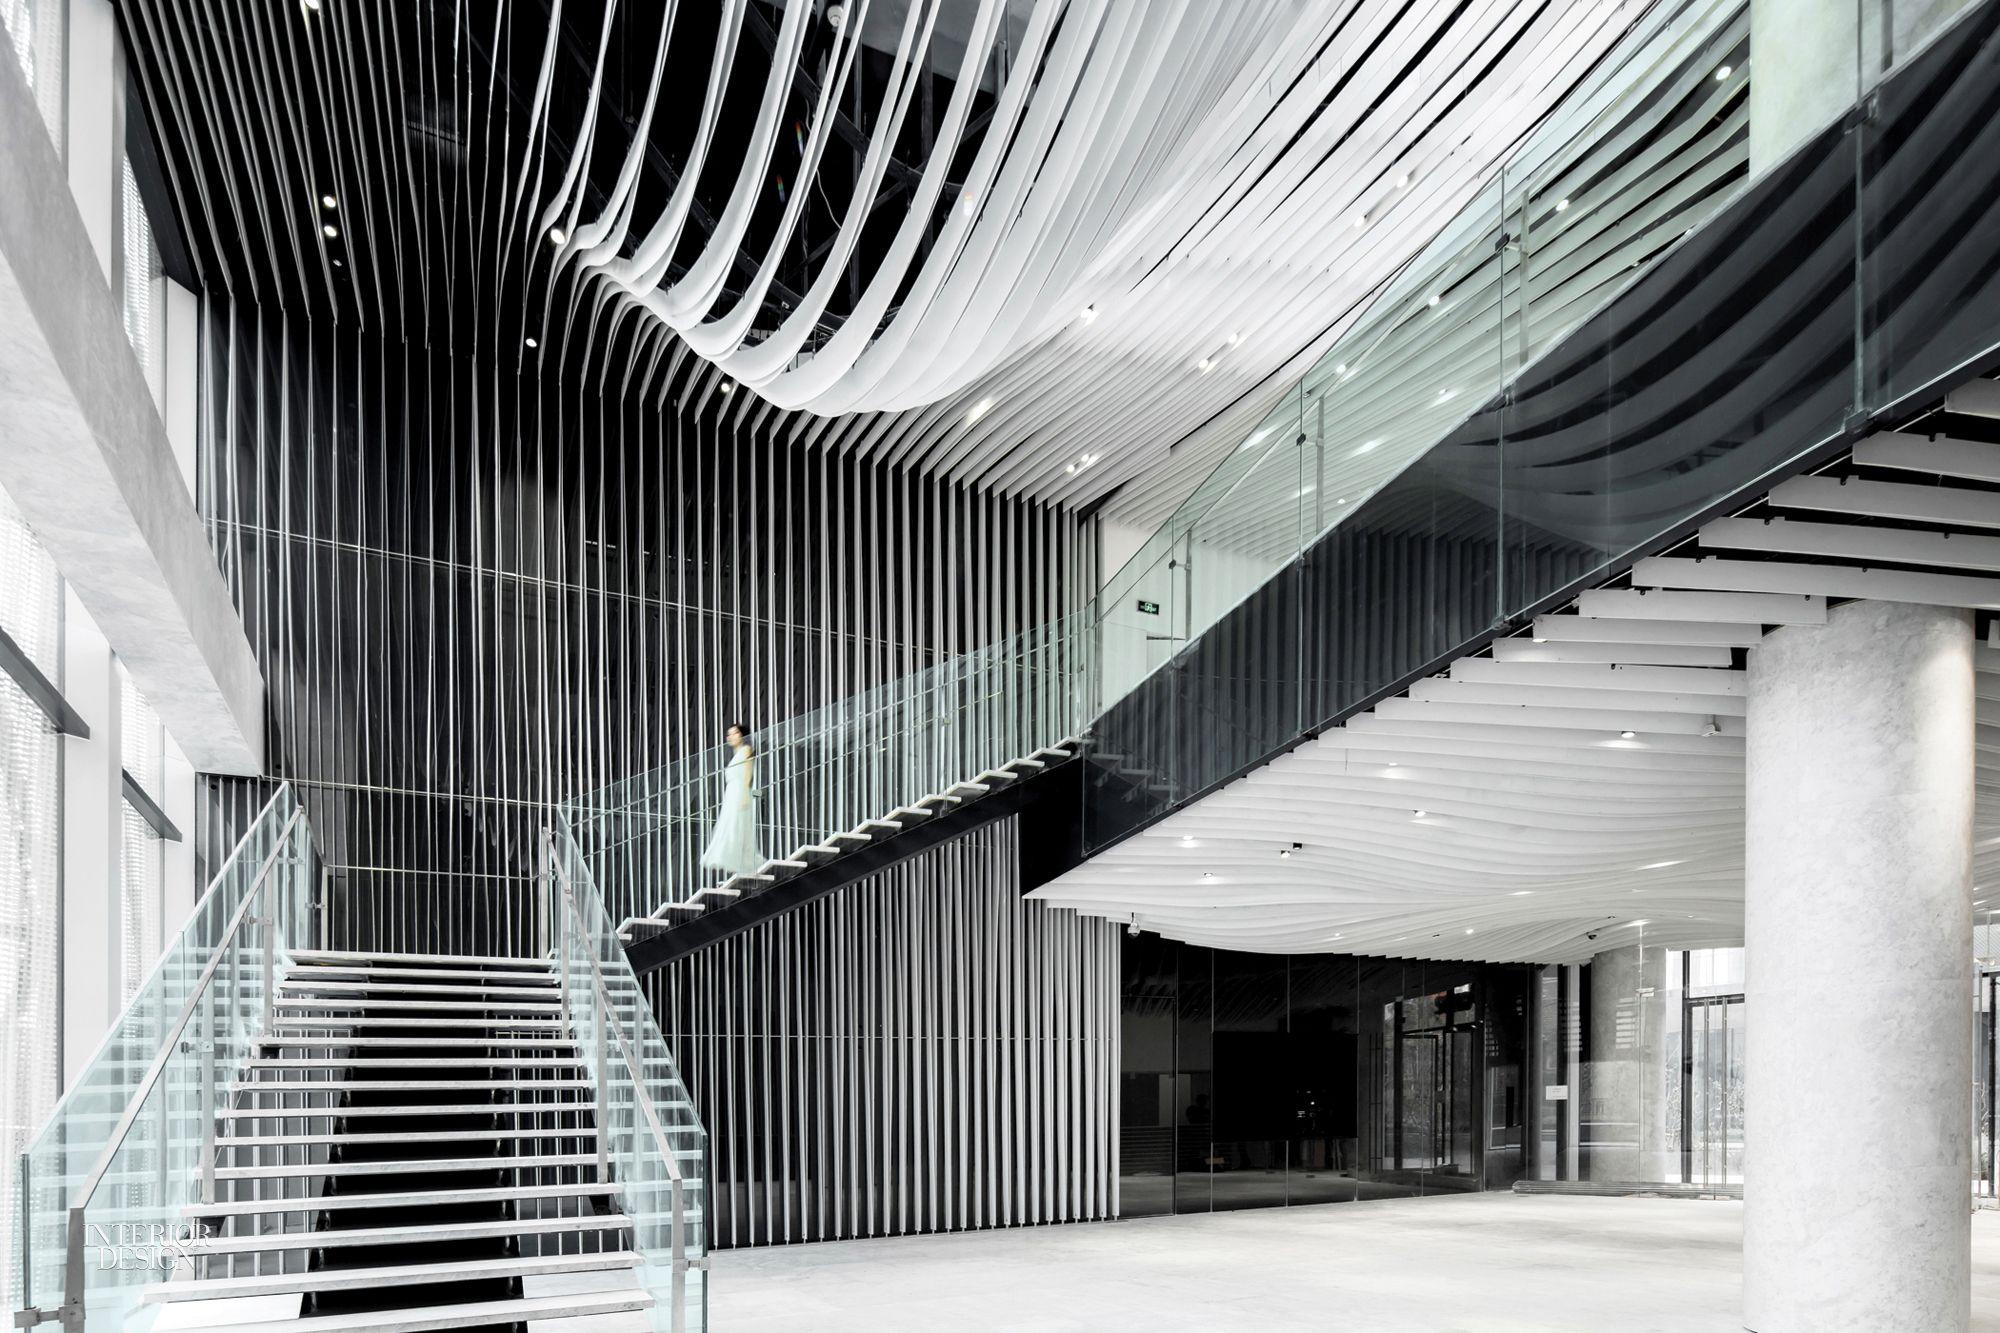 Hongkou soho by kengo kuma 2016 best of year winner for - Interior design magazine best of year ...